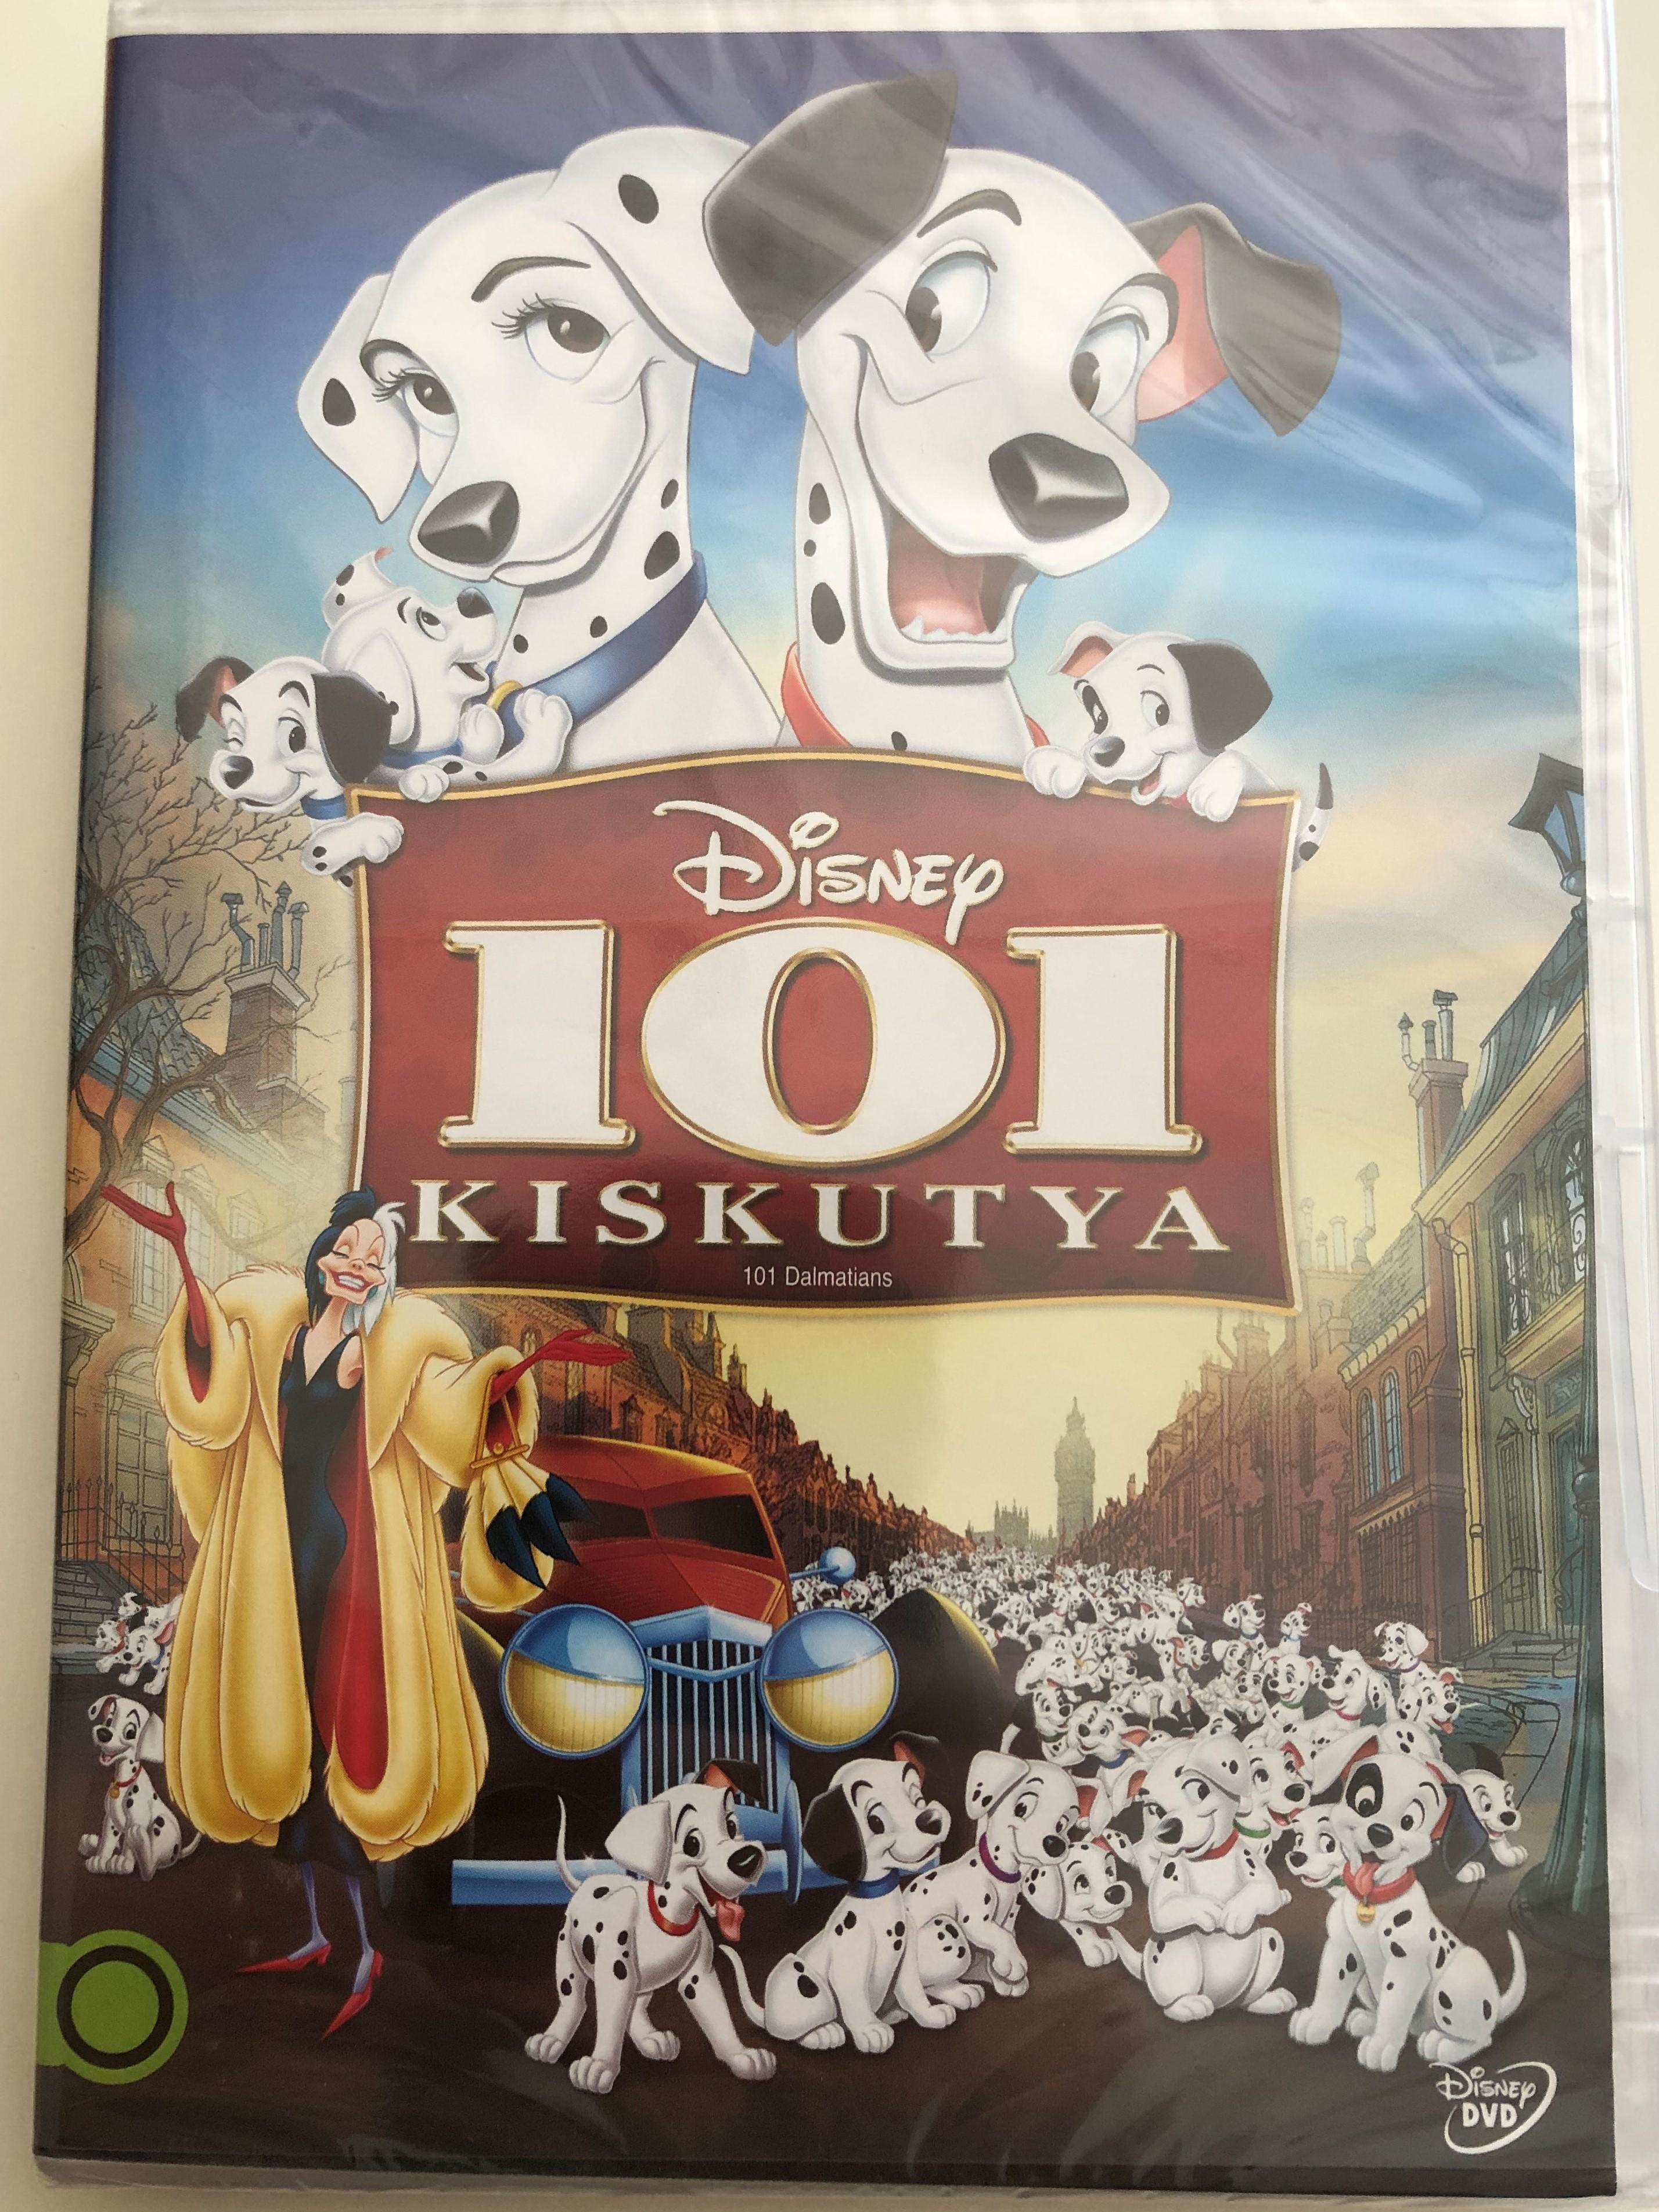 101-dalmatians-dvd-1961-101-kiskutya-disney-directed-by-wolfgang-reitherman-hamilton-luske-clyde-geronimi-starring-rod-taylor-cate-bauer-betty-lou-gerson-ben-wright-lisa-davis-1-.jpg